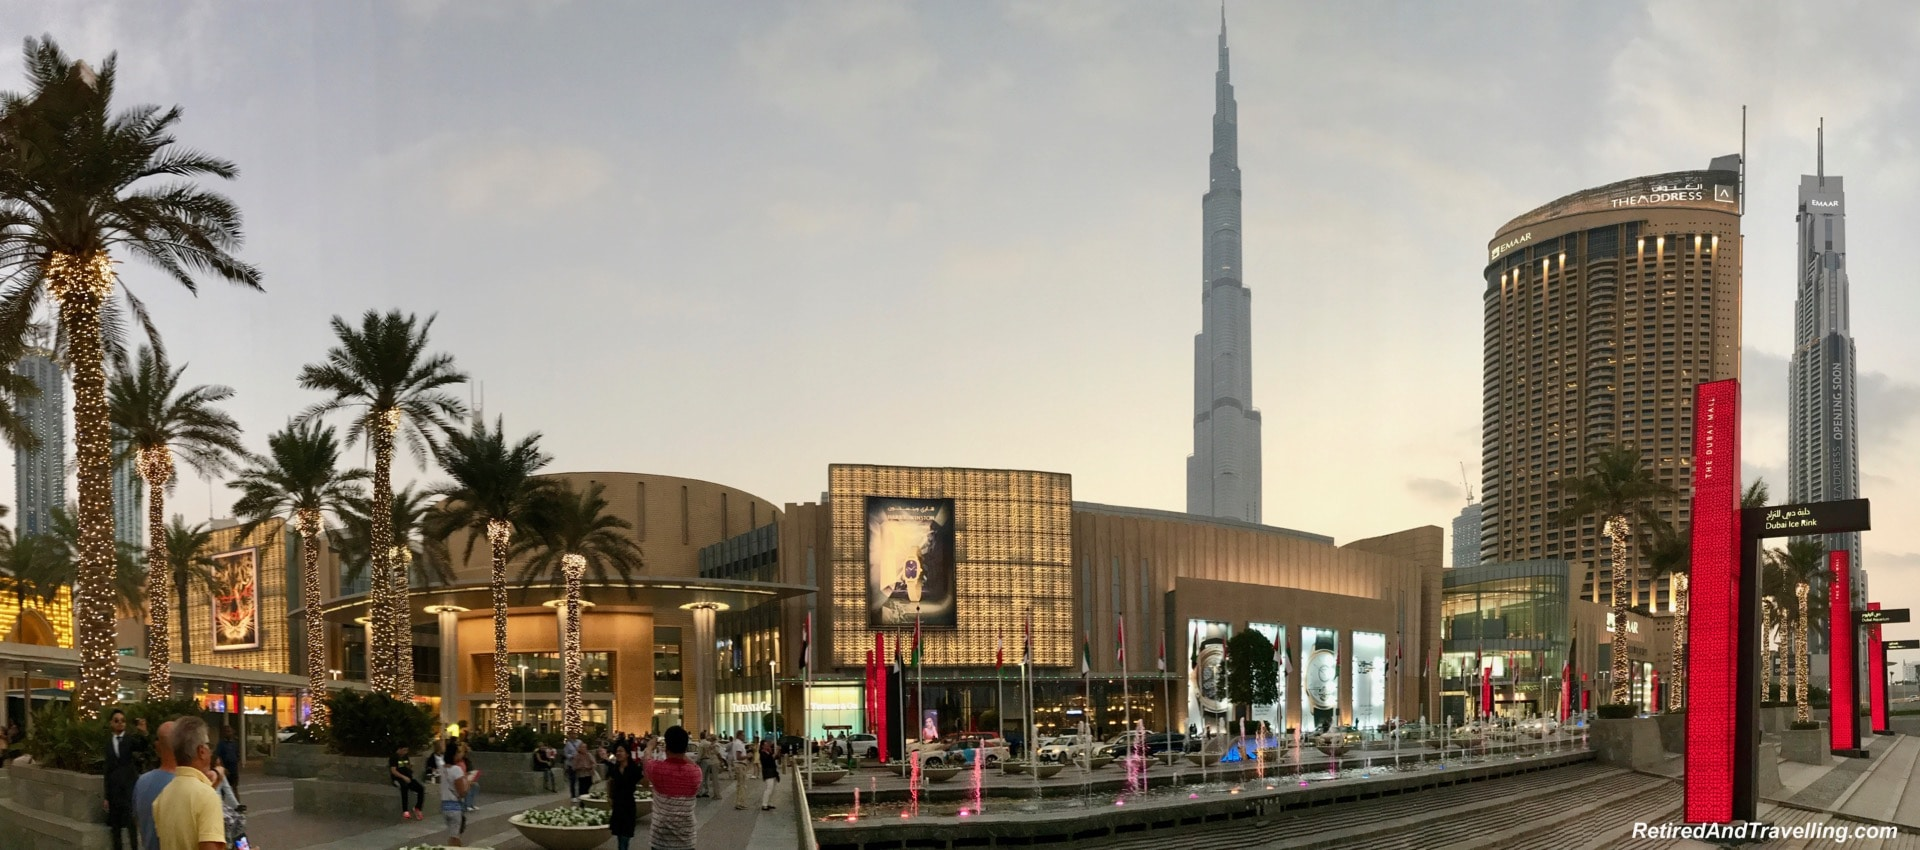 Burj Khalifa - Buidings and Architecture - Things To Do In Dubai.jpg